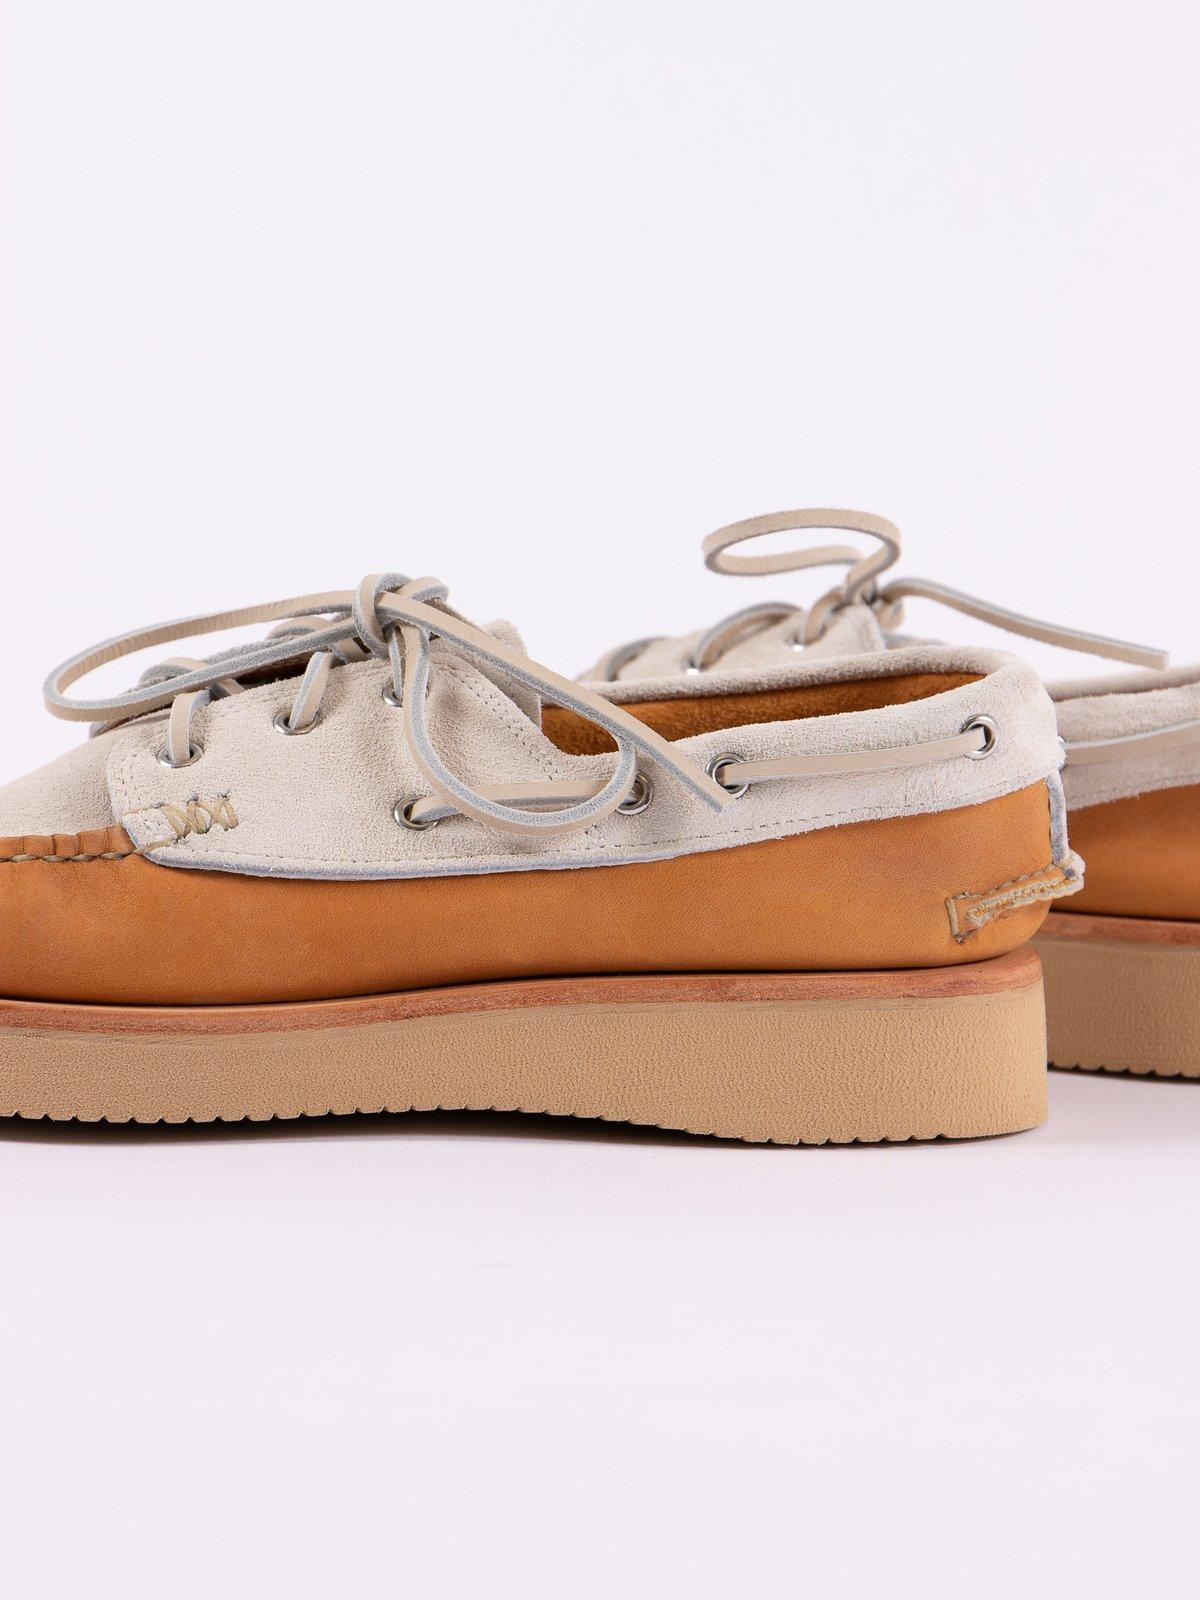 BB Tan/FO White Boat Shoe Exclusive - Image 4